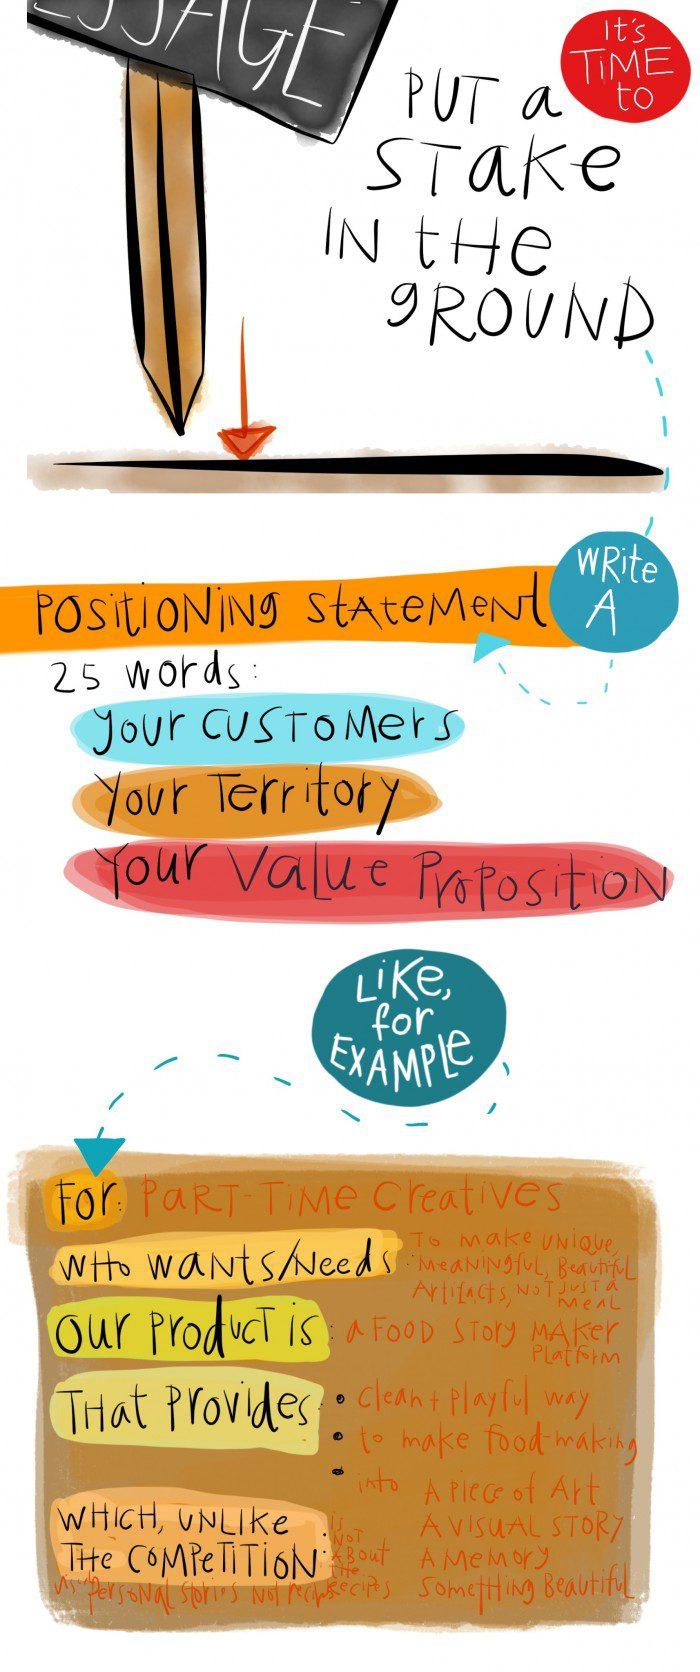 Margaret Hagan - How to Brand a Design